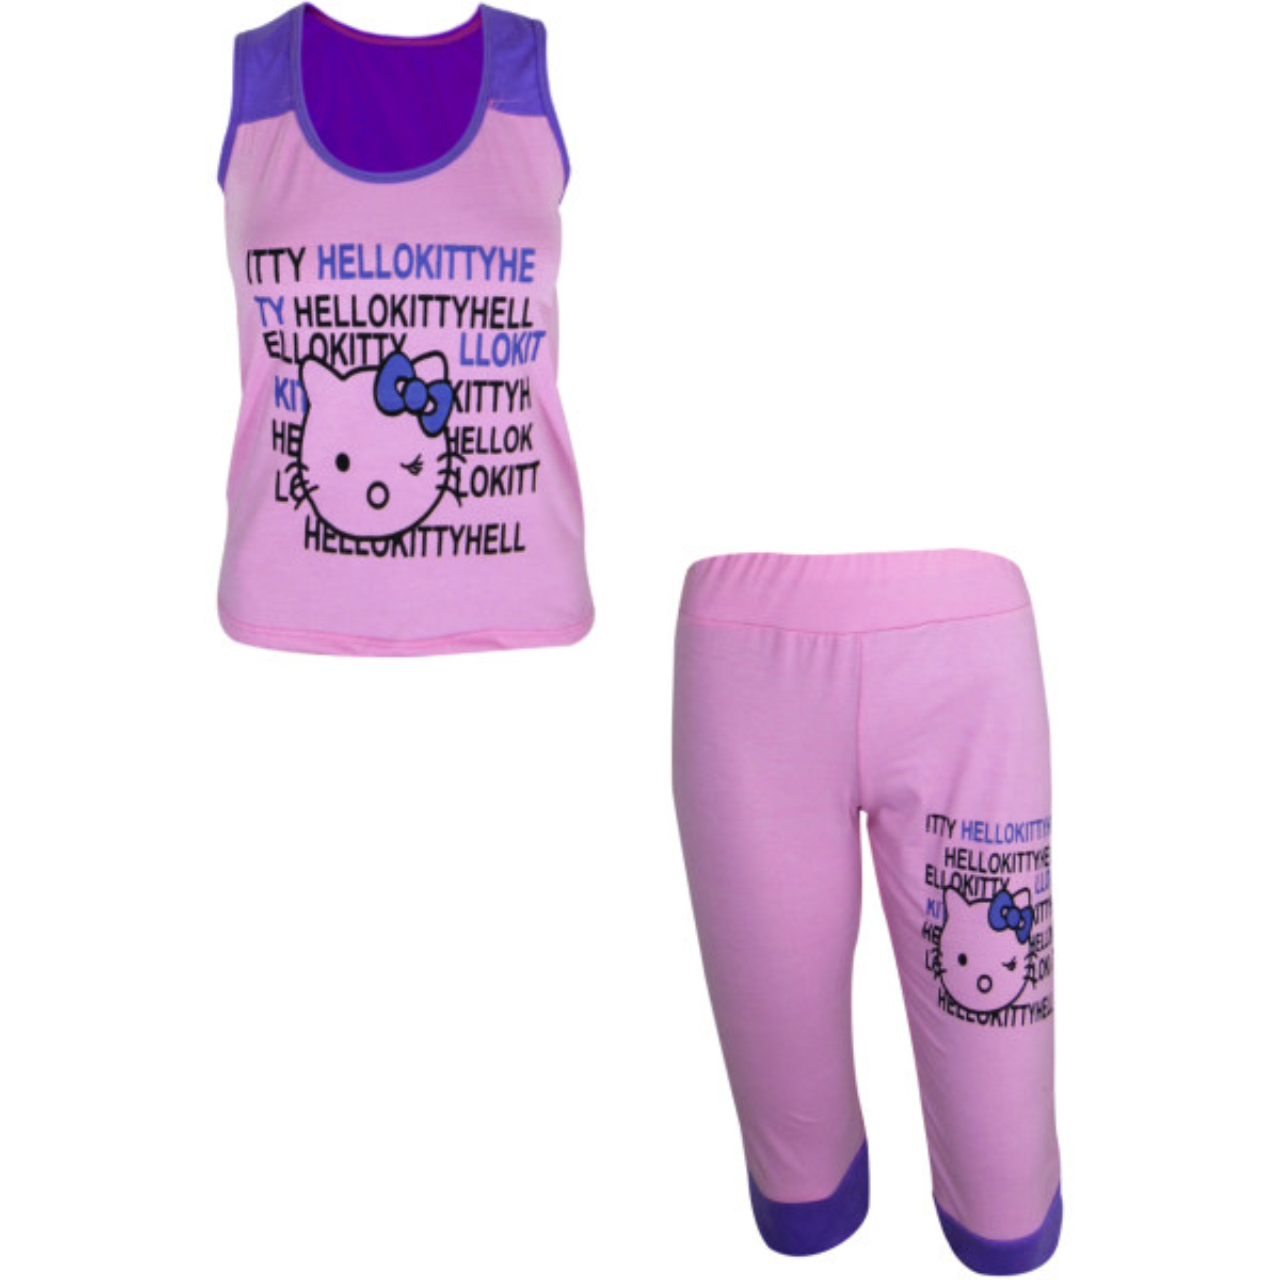 ست تاپ و شلوارک مدل Kitty-H رنگ صورتی بنفش              👗